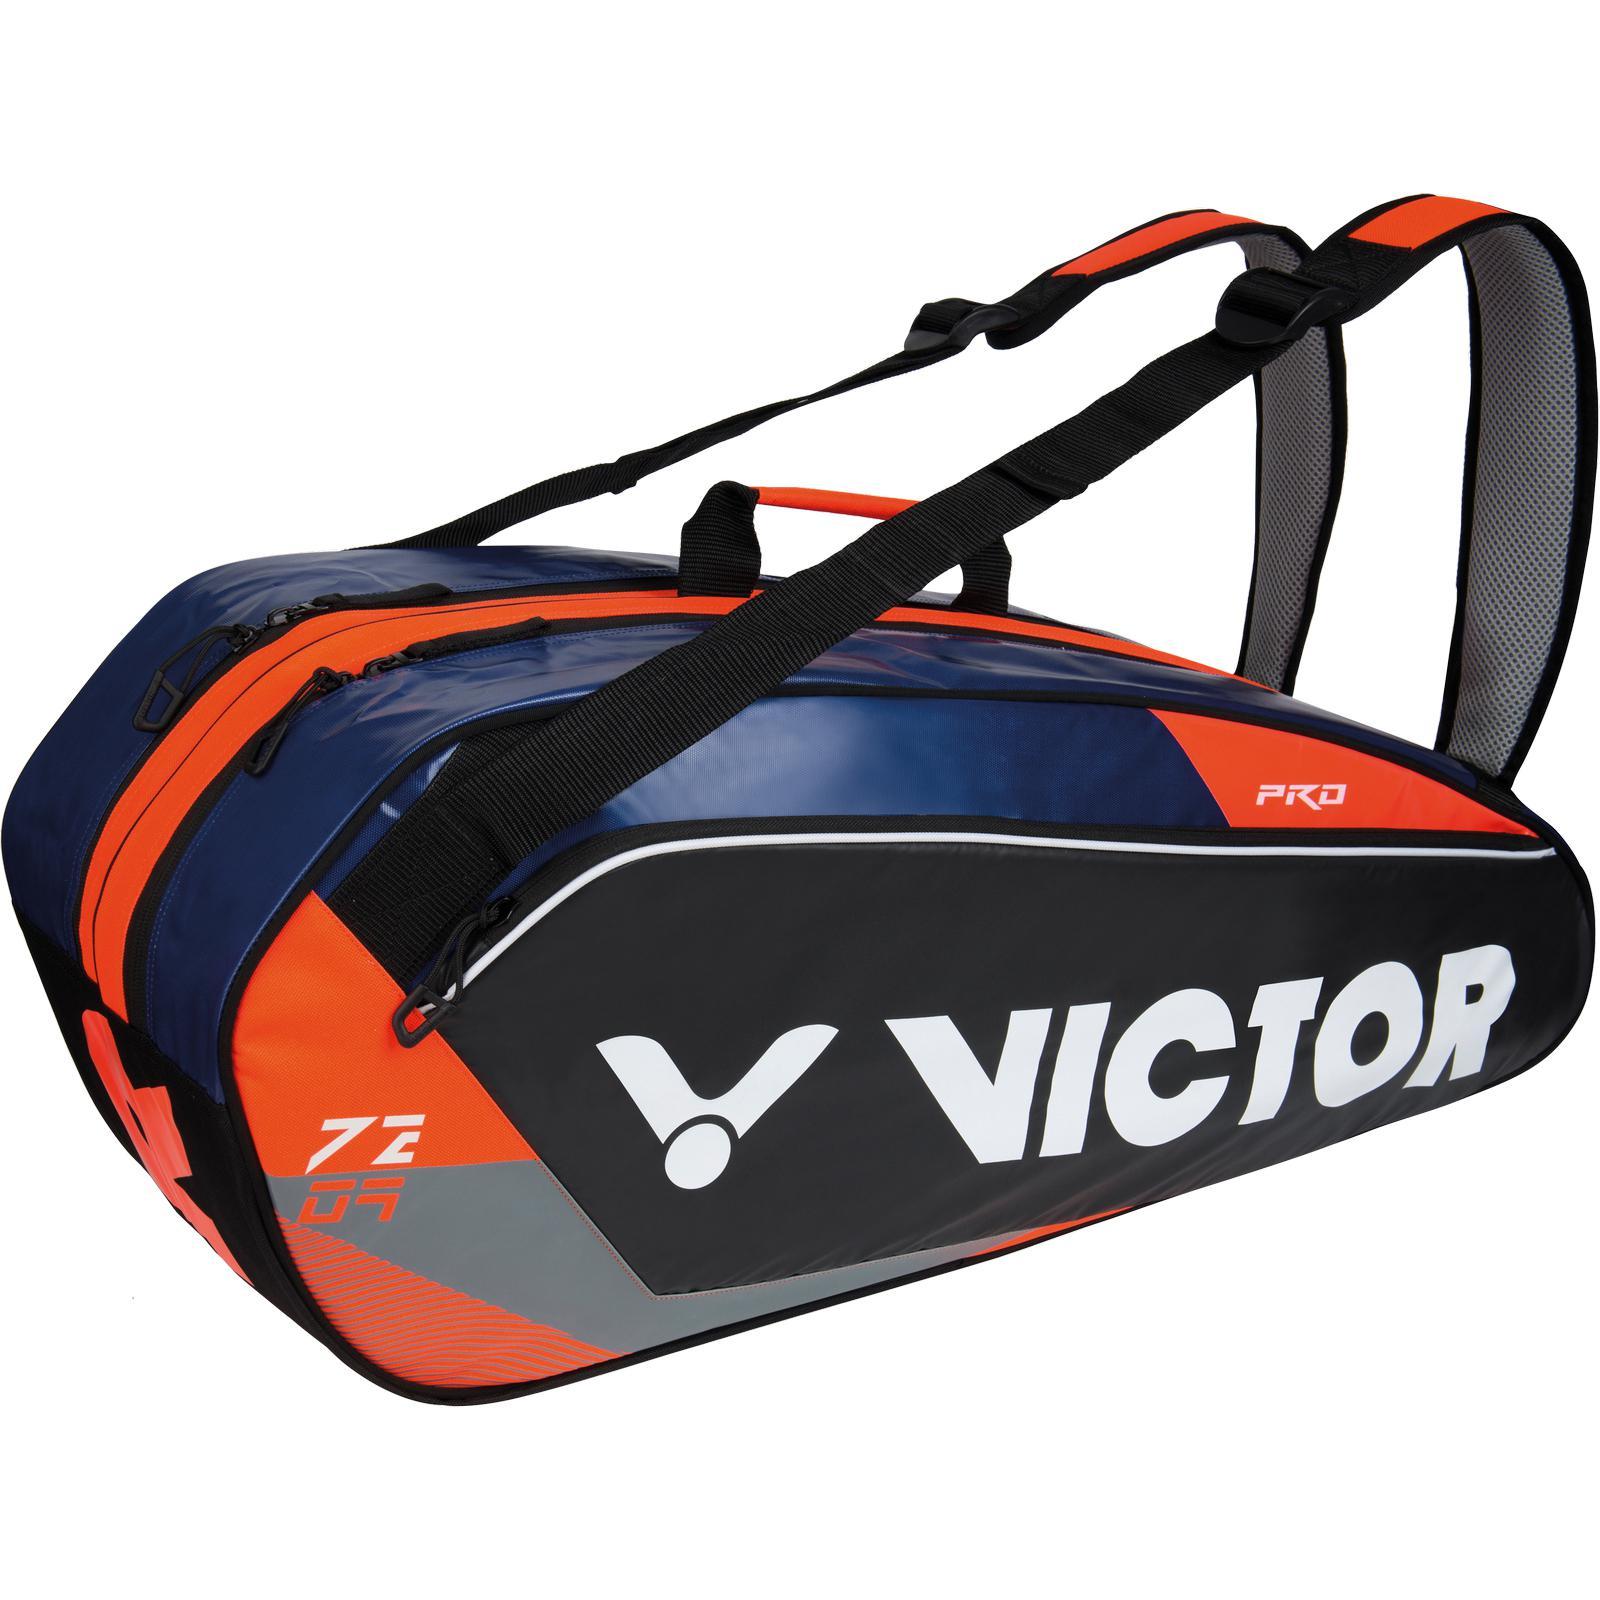 b71b2d2f0b Victor Double Thermo Bag (7209) - Blue/Orange - Tennisnuts.com